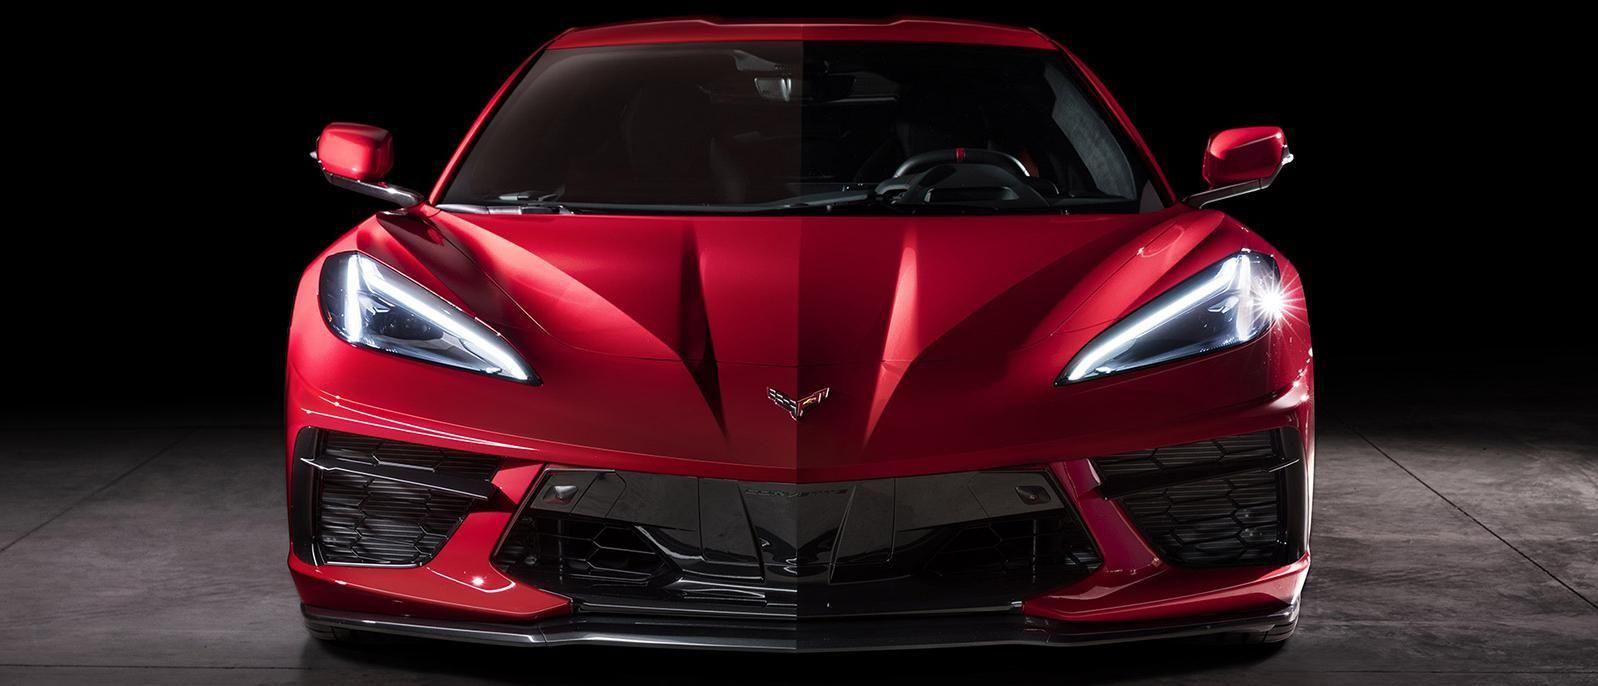 Stand Alone 2020 Chevrolet Corvette C8 MidEngine